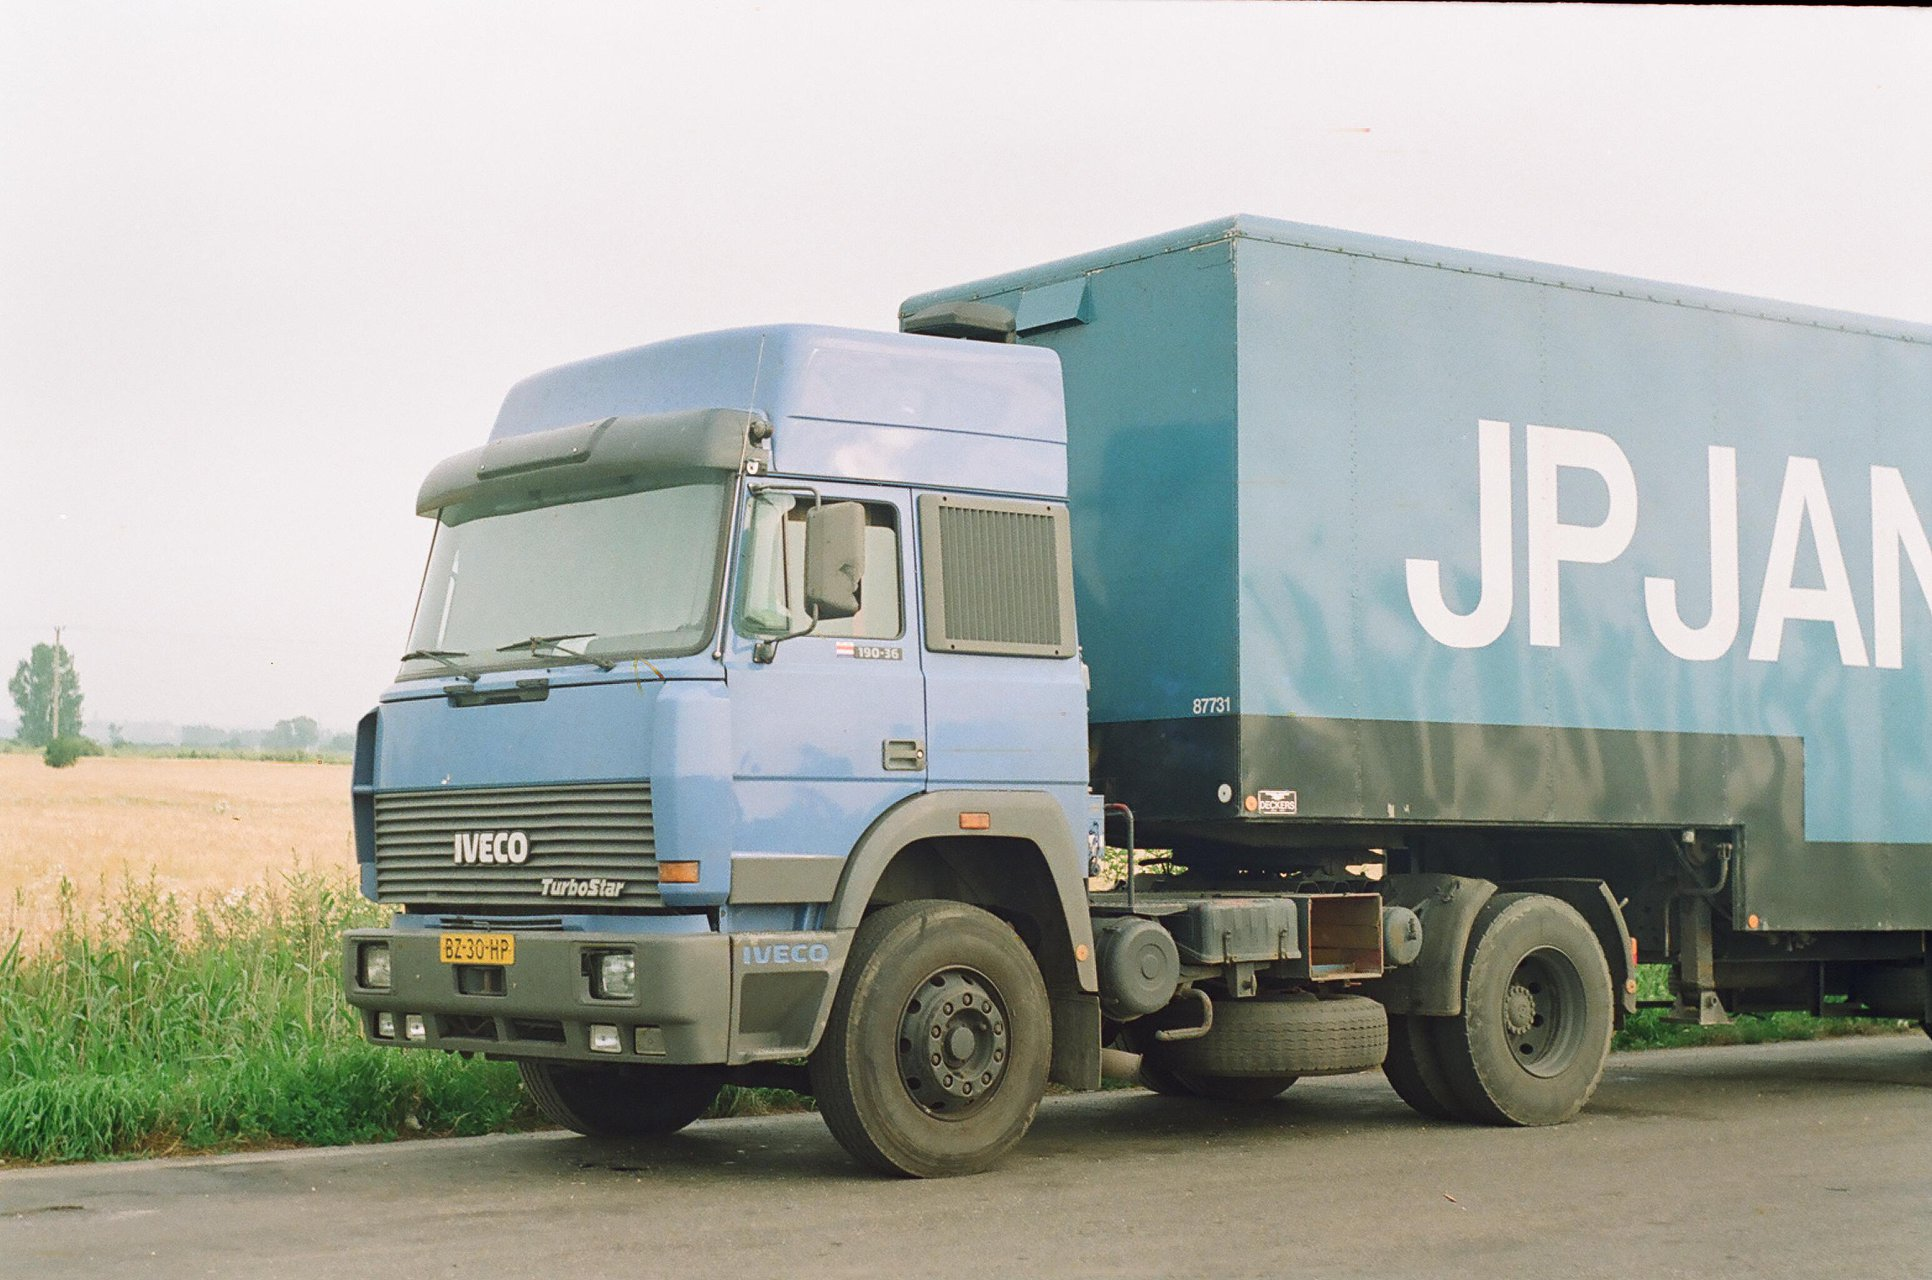 Iveco-Turbostar-Harrie-Schreurs-archief